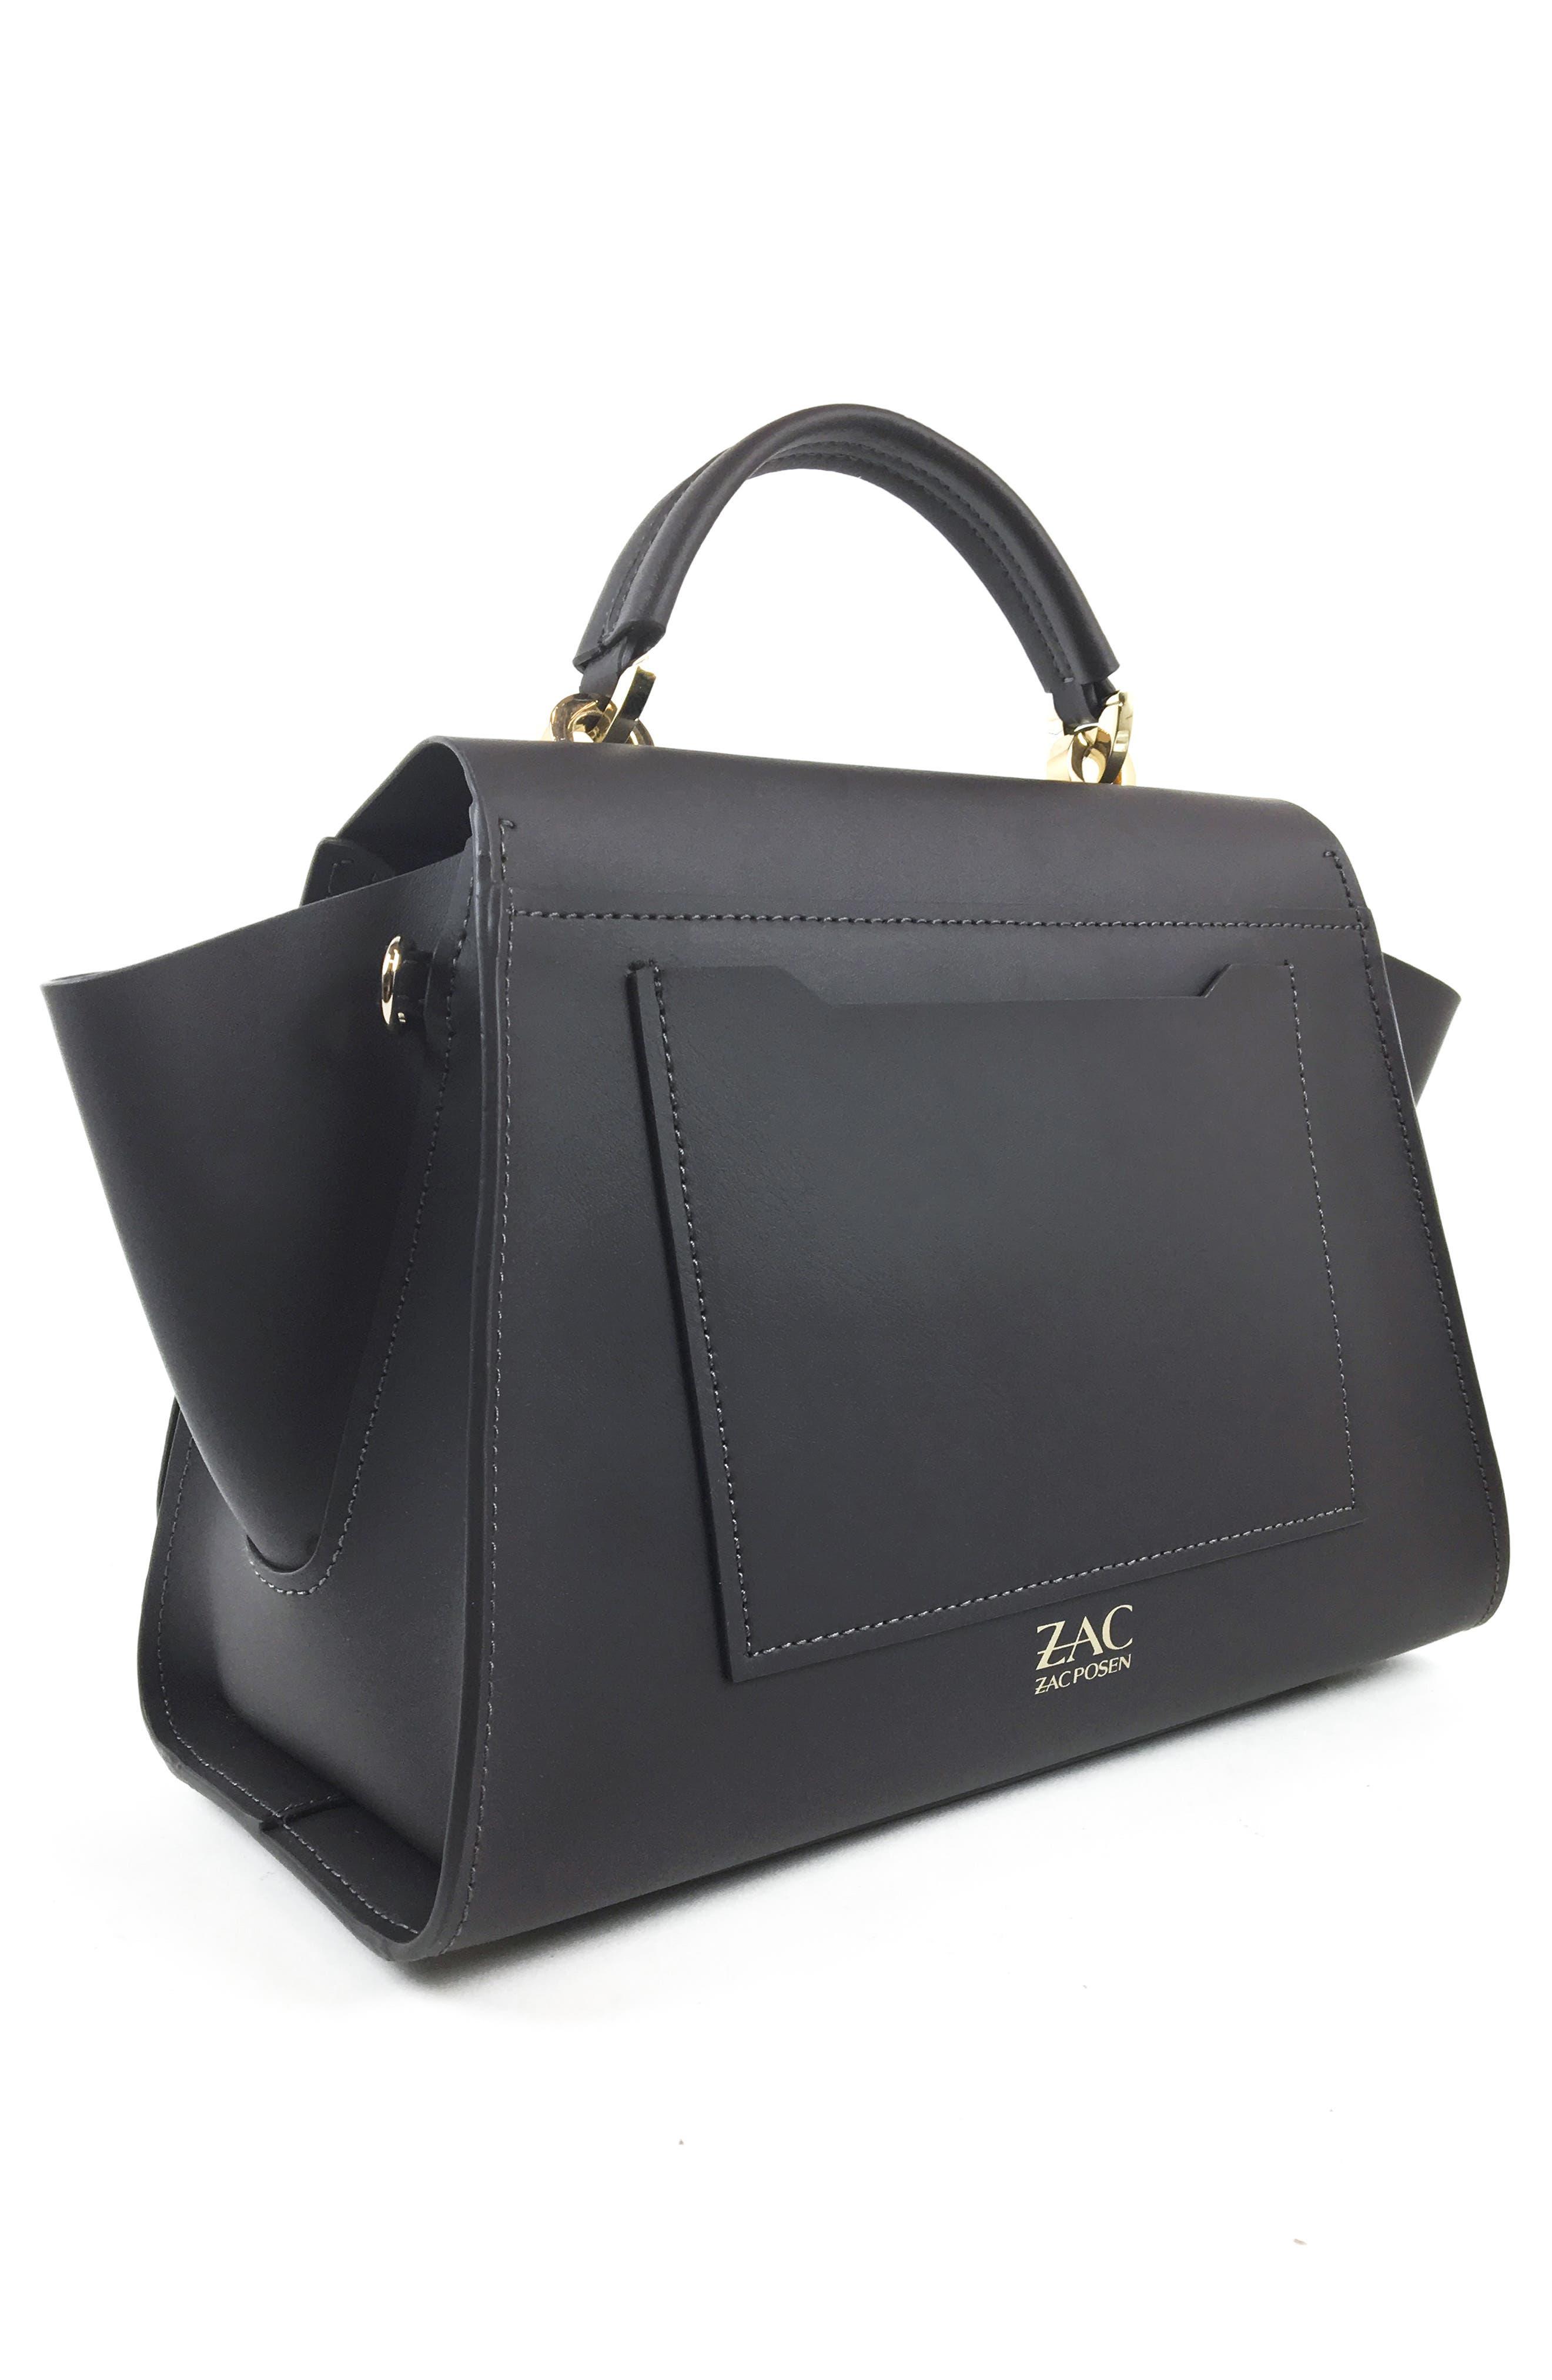 49c2883d75cd ZAC Zac Posen Handbags   Wallets for Women